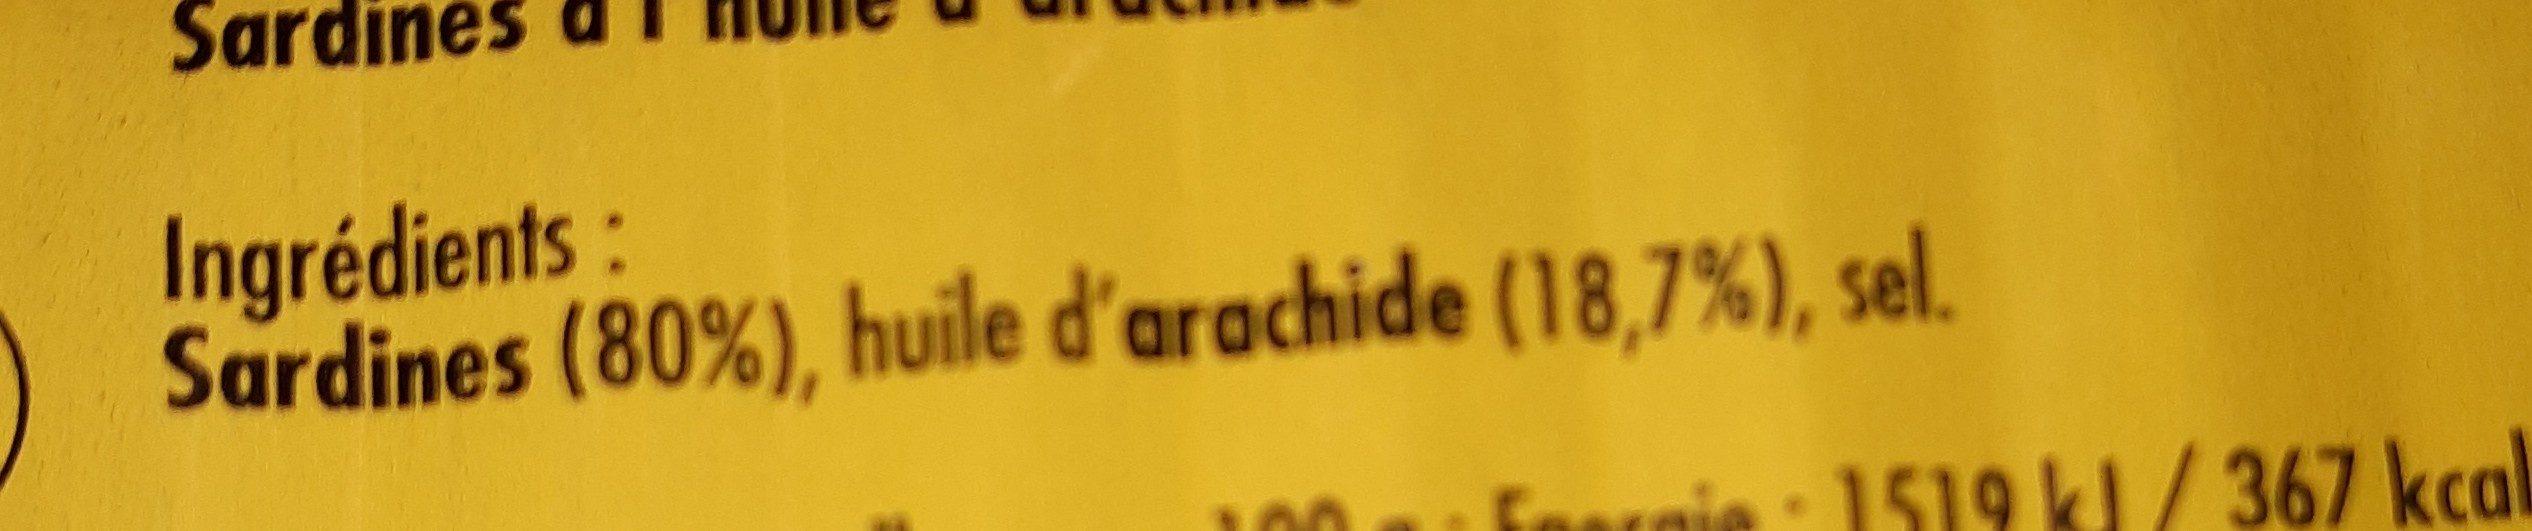 Sardine à l'huile d'arachide - Ingredienti - fr